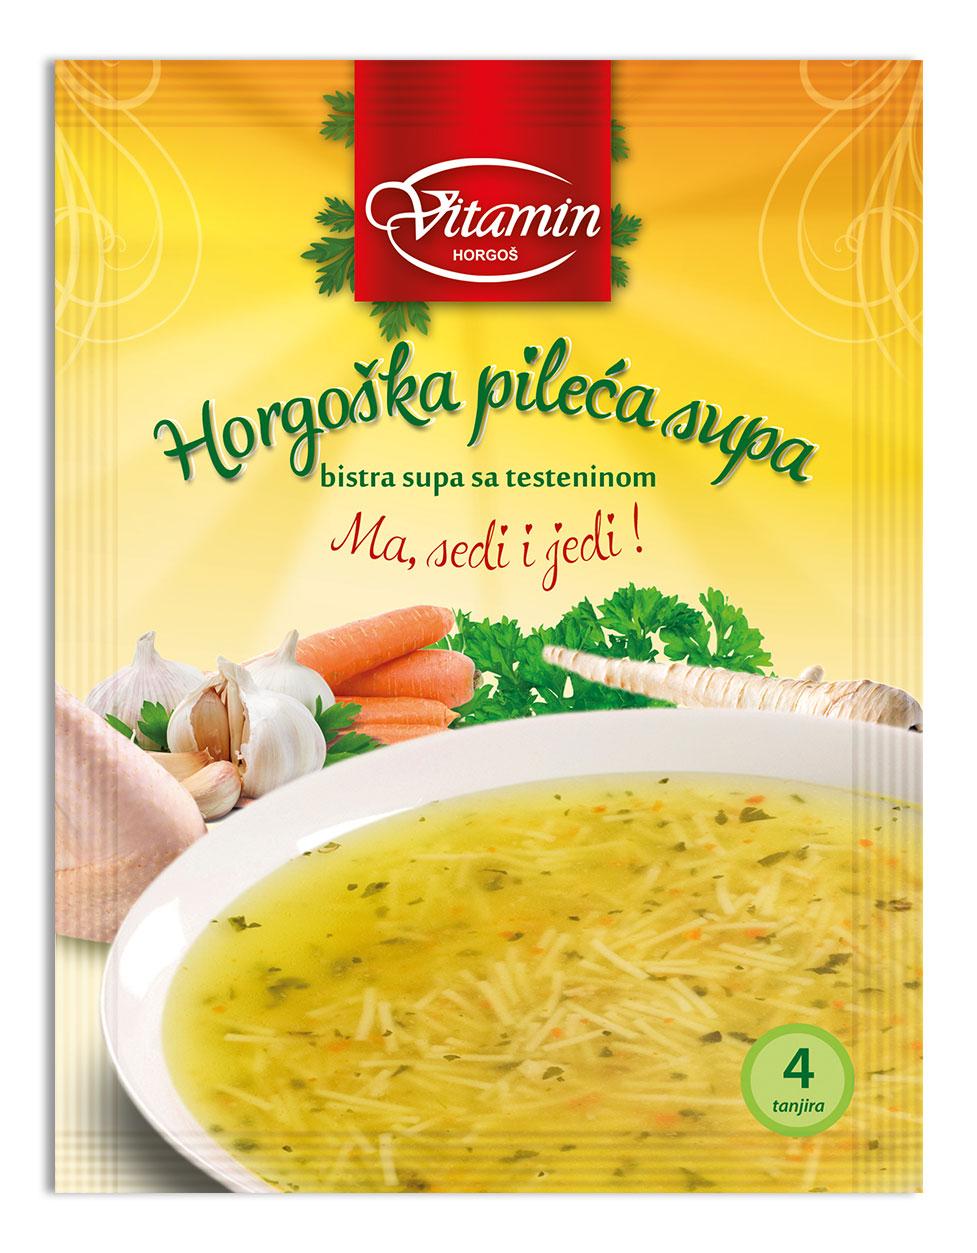 vitamin pakovanje 4